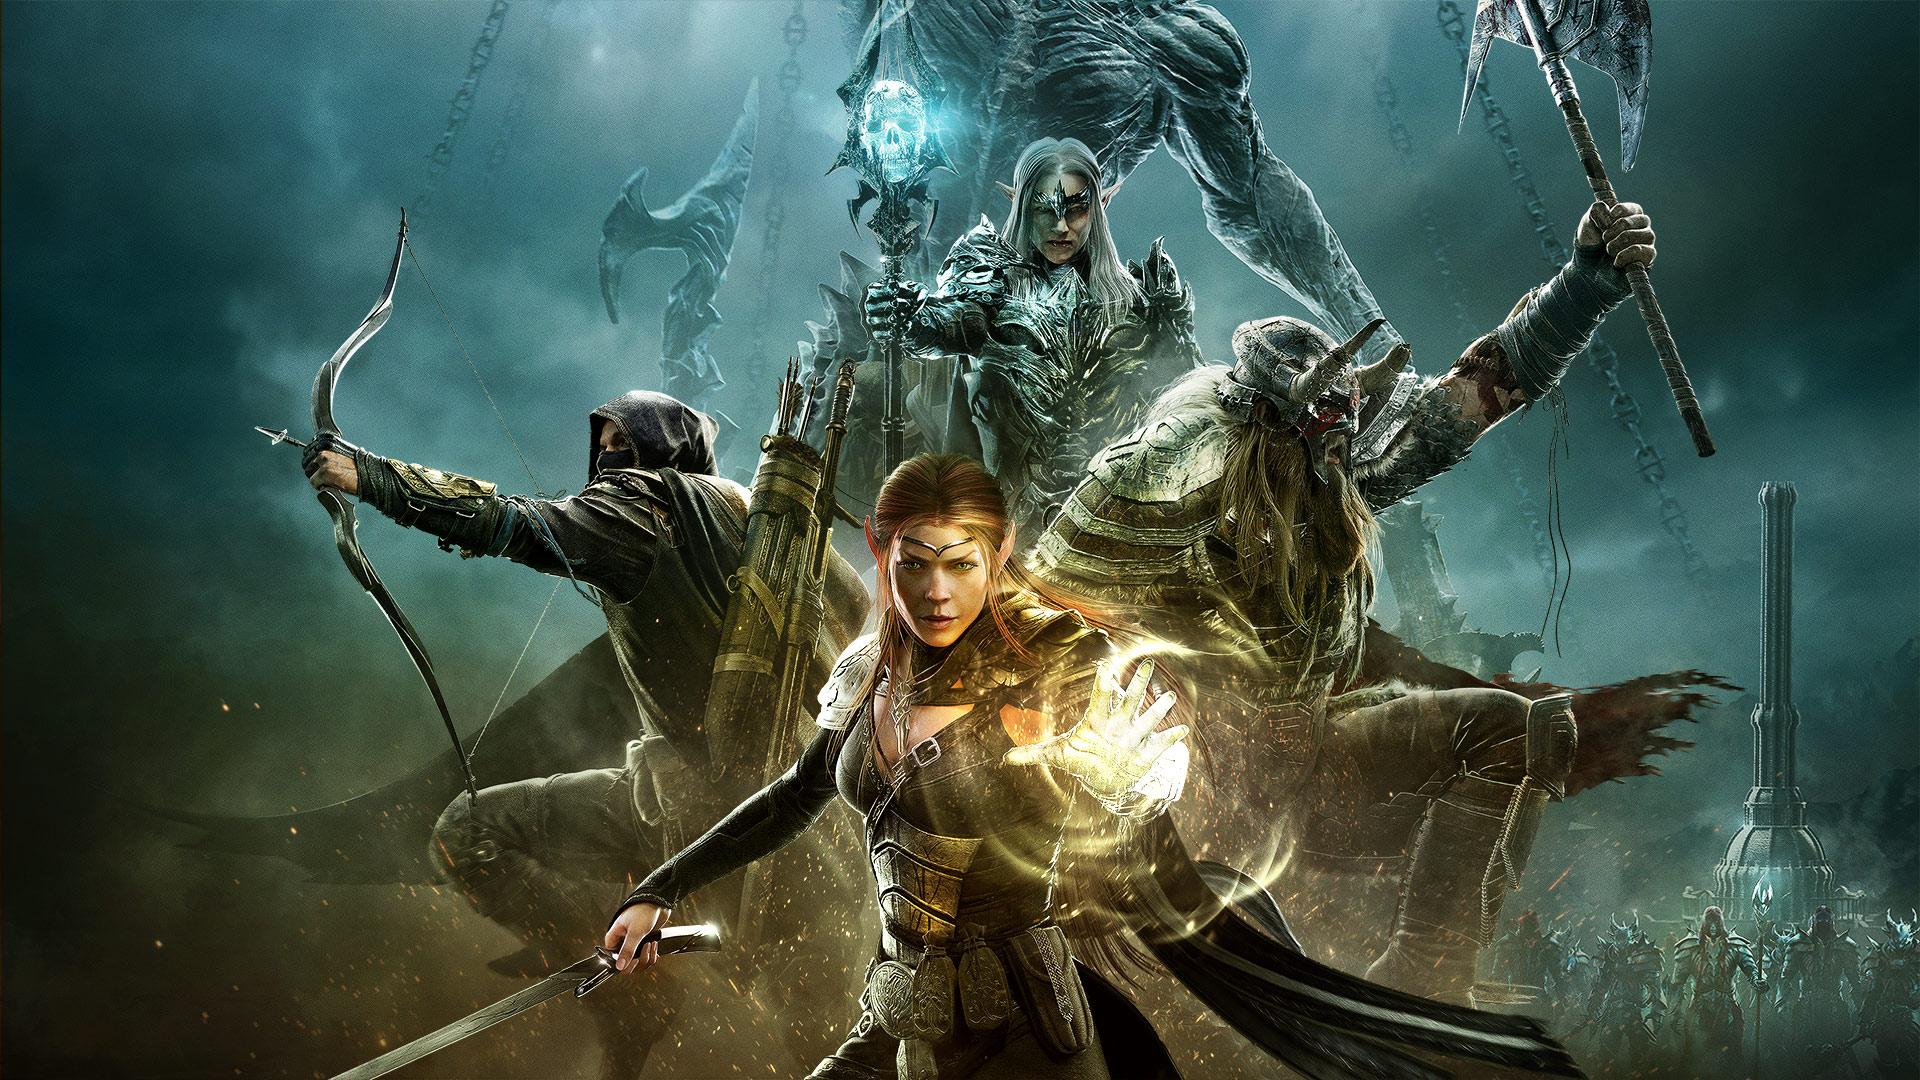 The-Elder-Scrolls-Online-Tamriel-Unlimited-VGProfessional-5.jpg